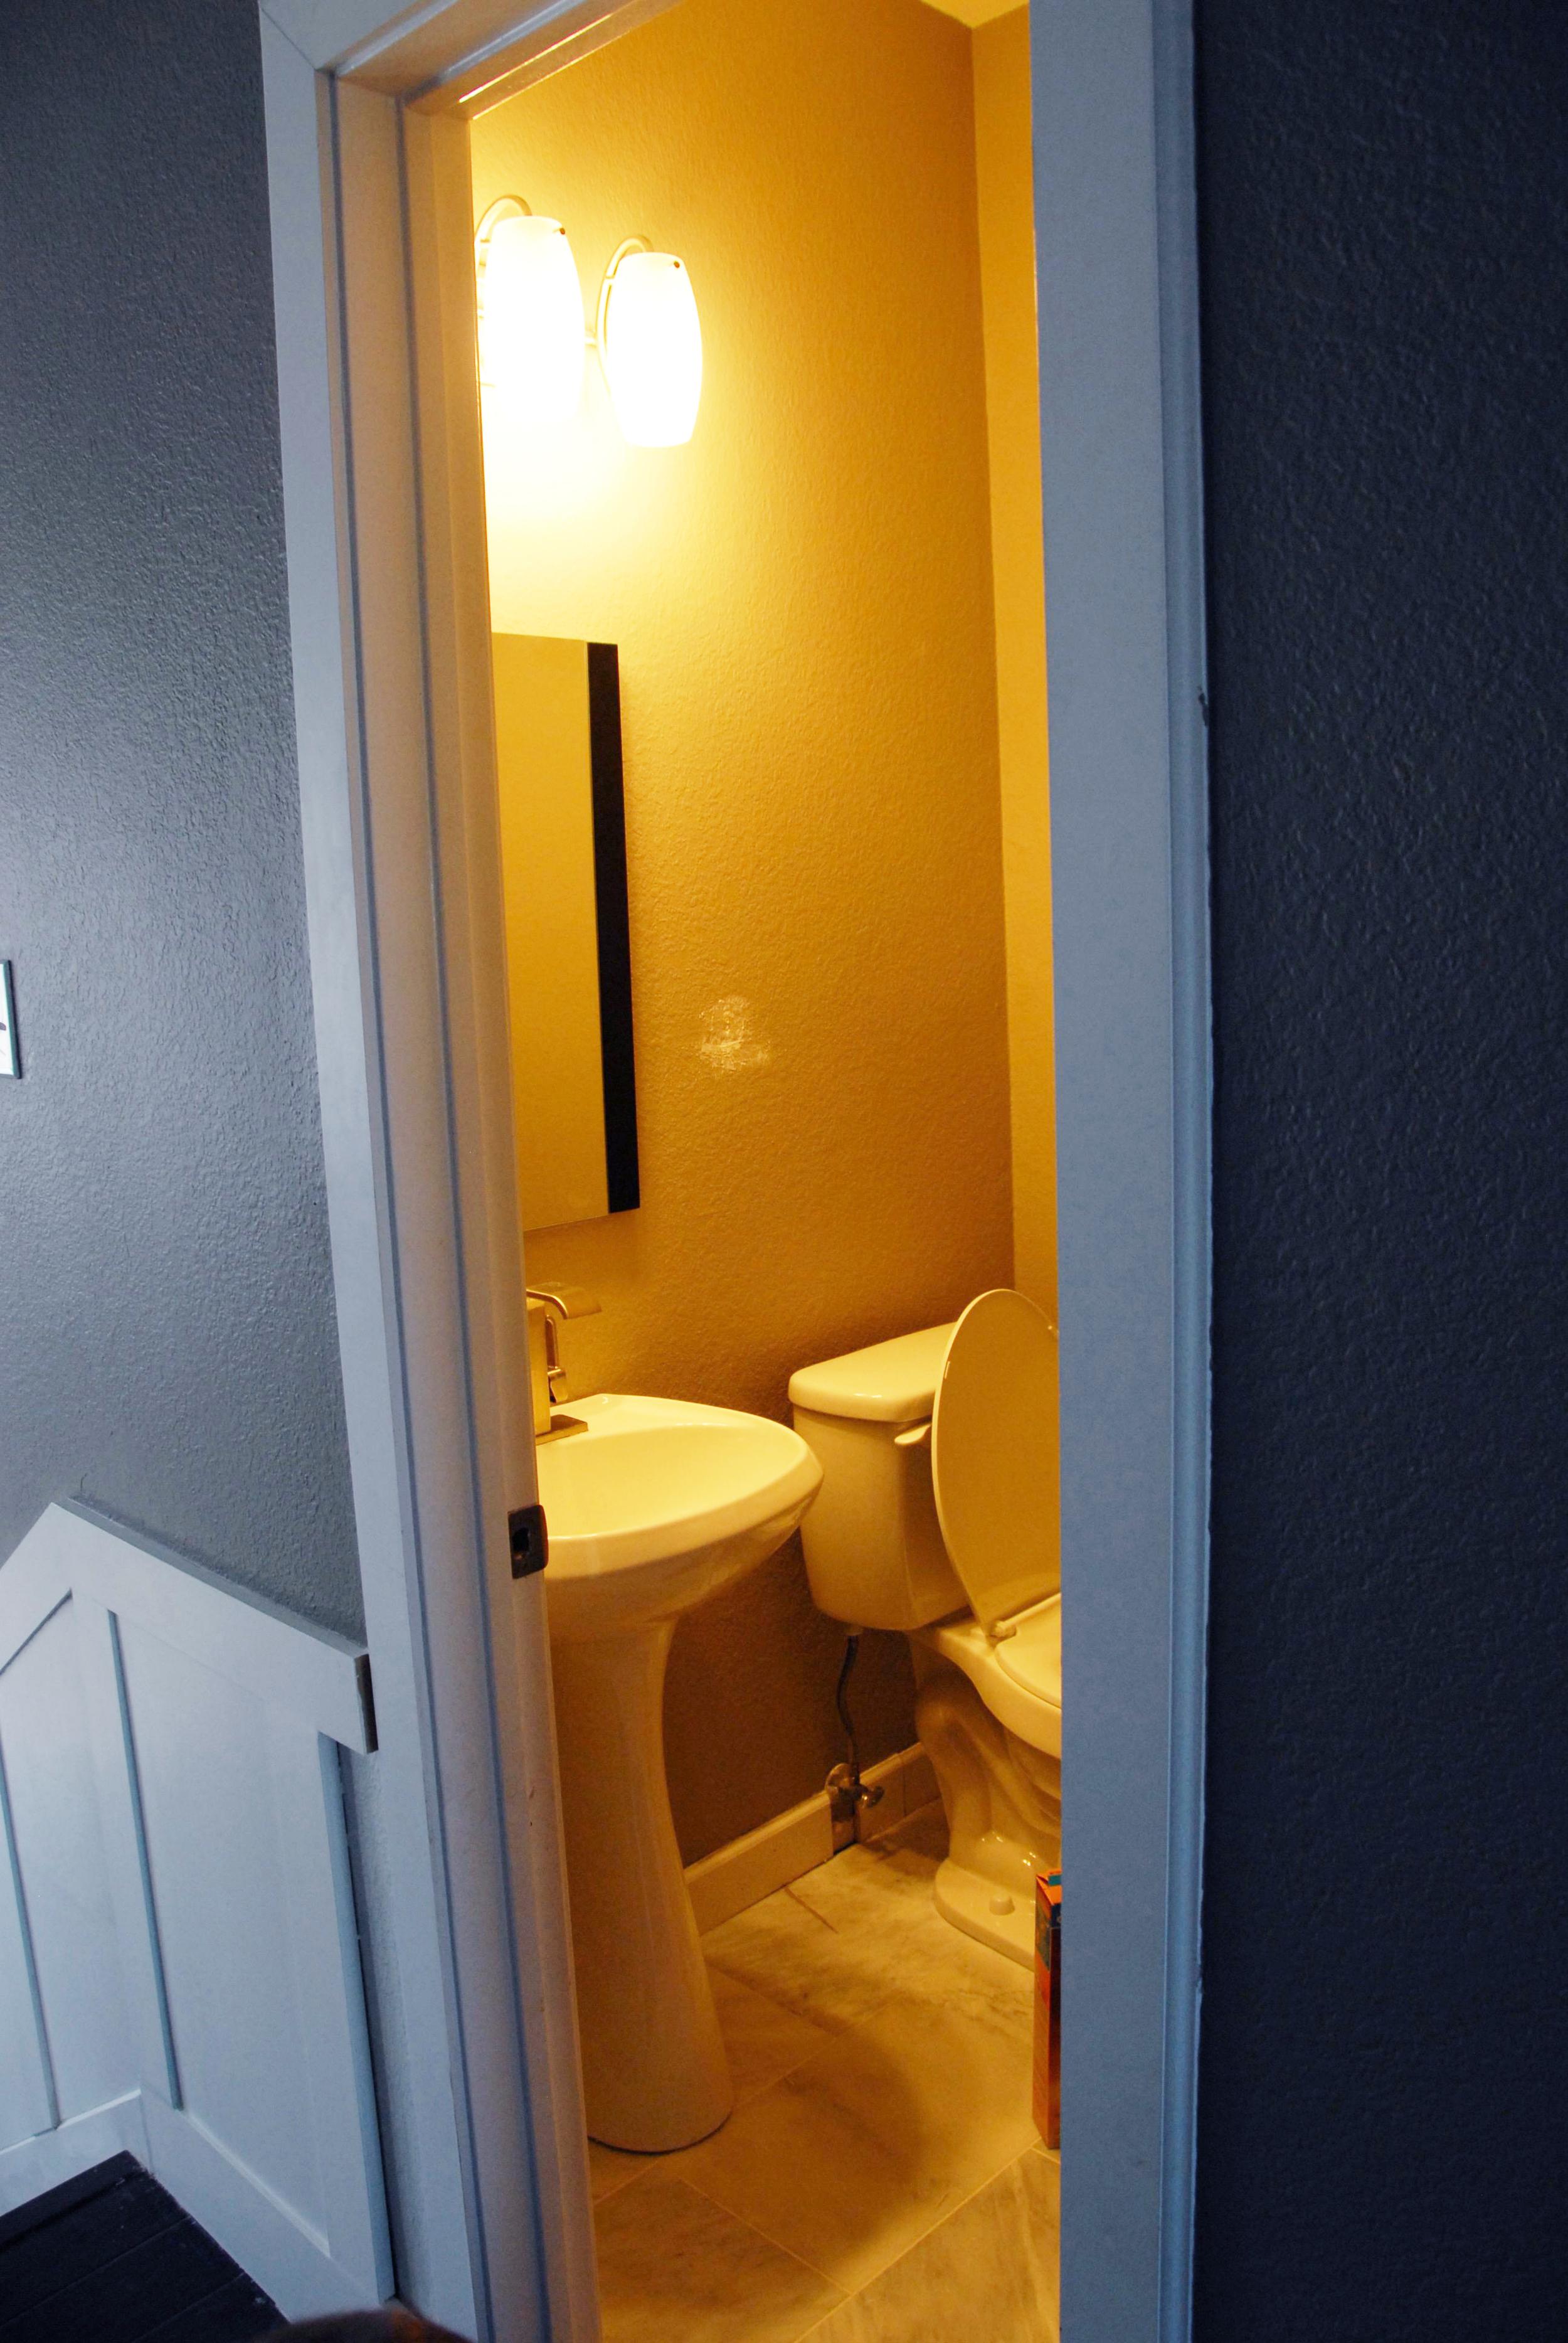 Our small powder room/half bath from the hallway